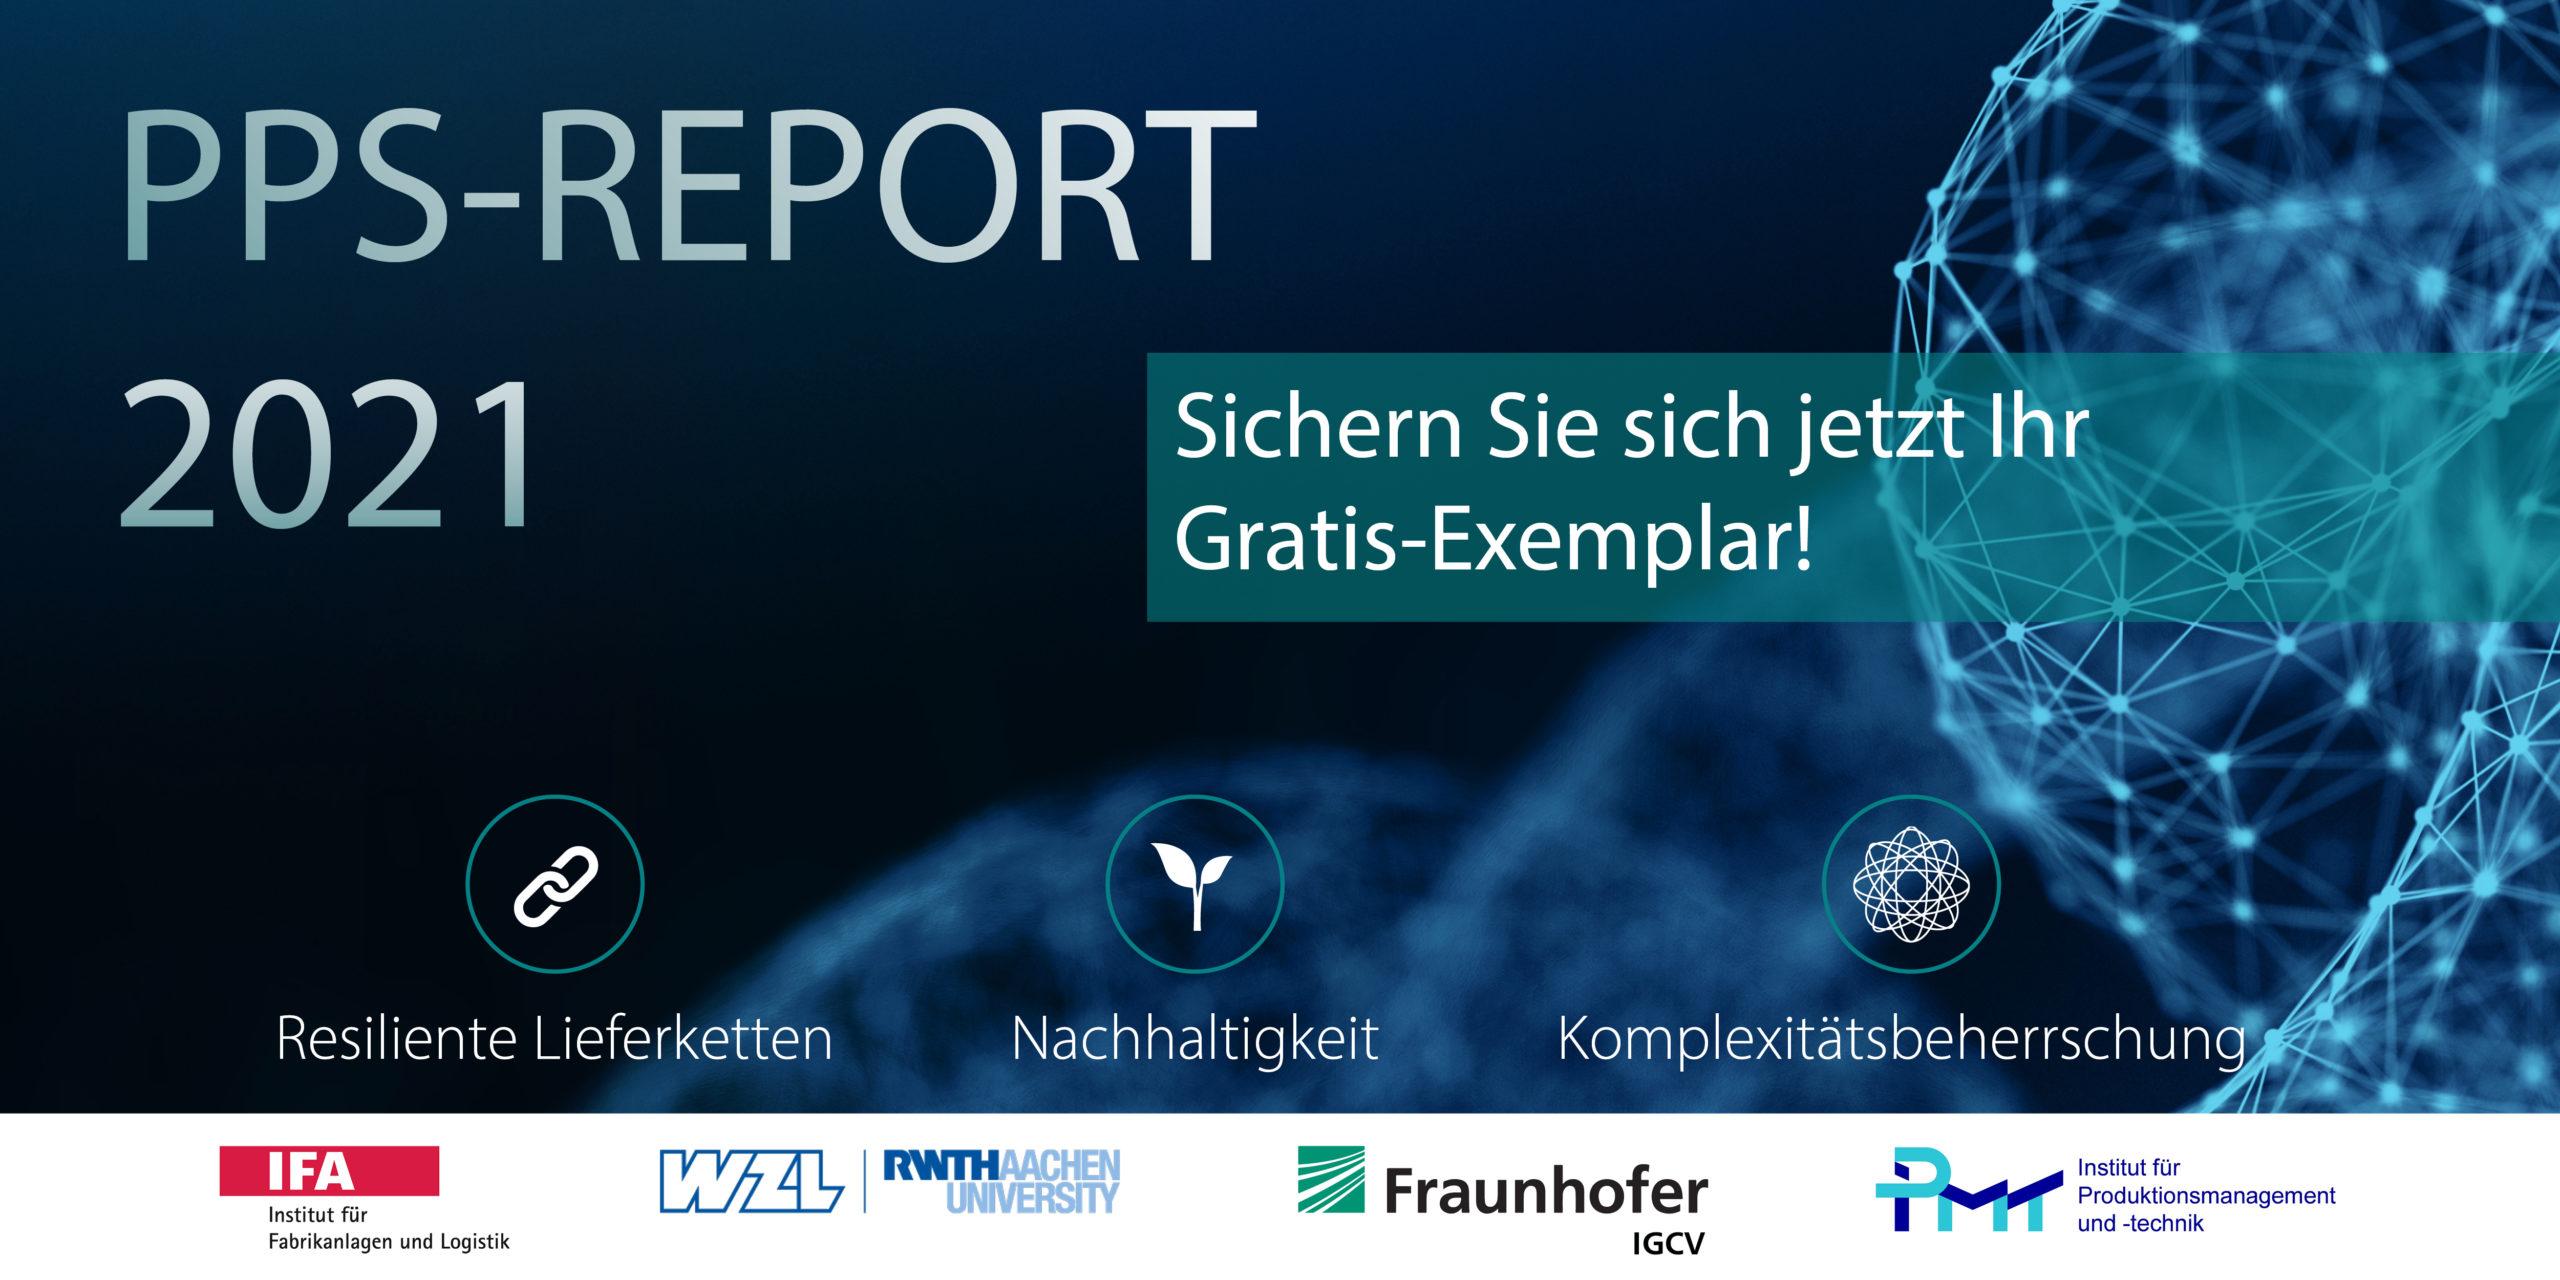 PPS-Report / Fraunhofer IGCV